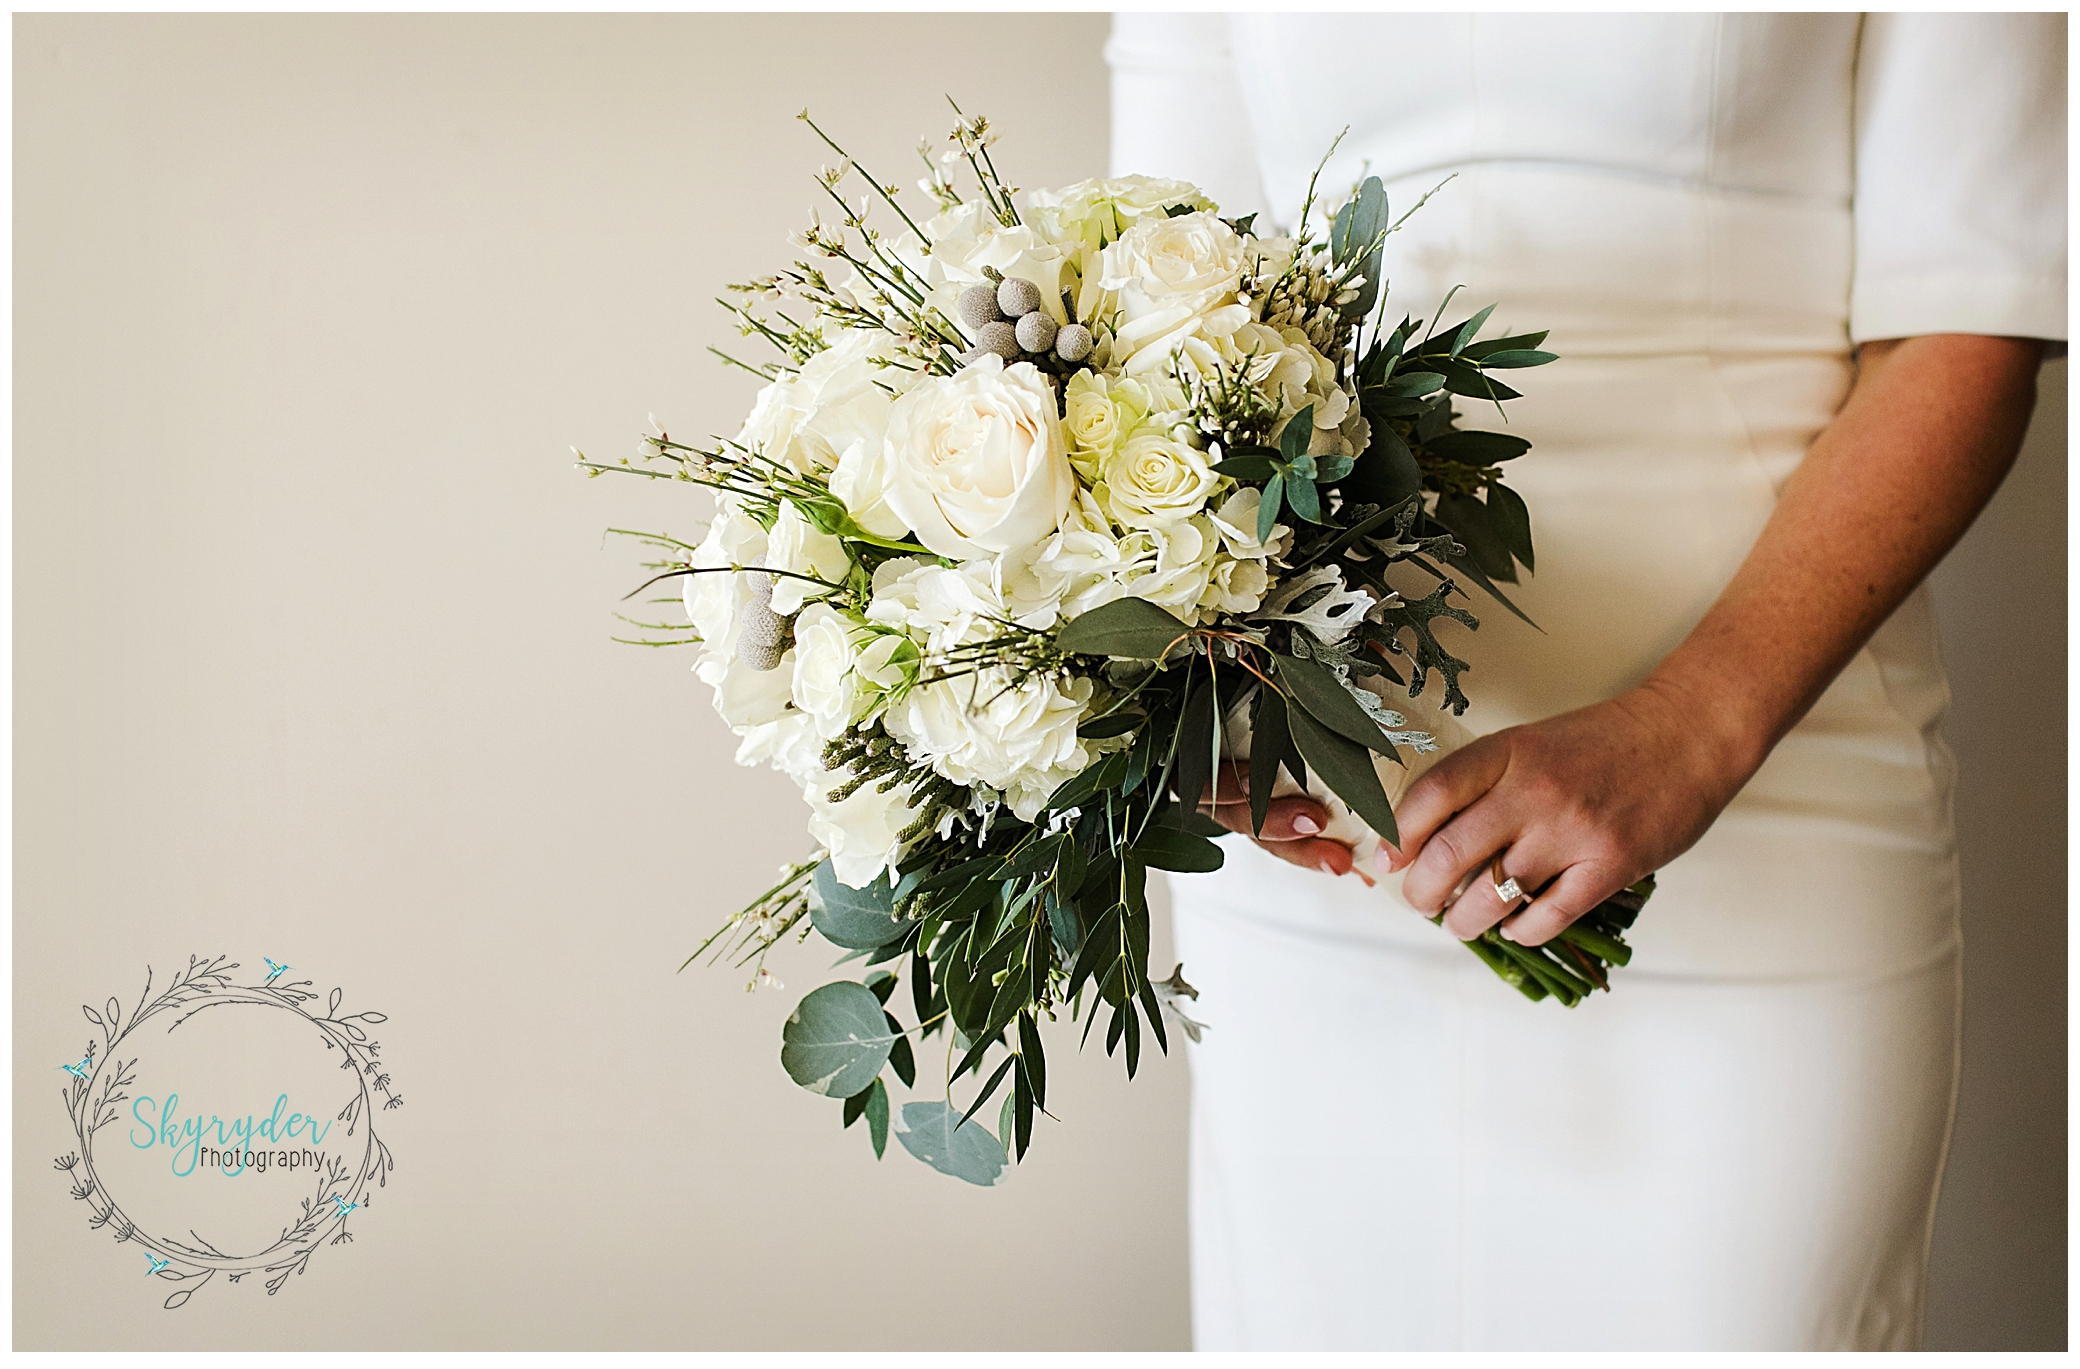 blacksburg-wedding-photographer-charlottesville-lexington-roanoke-skyryder